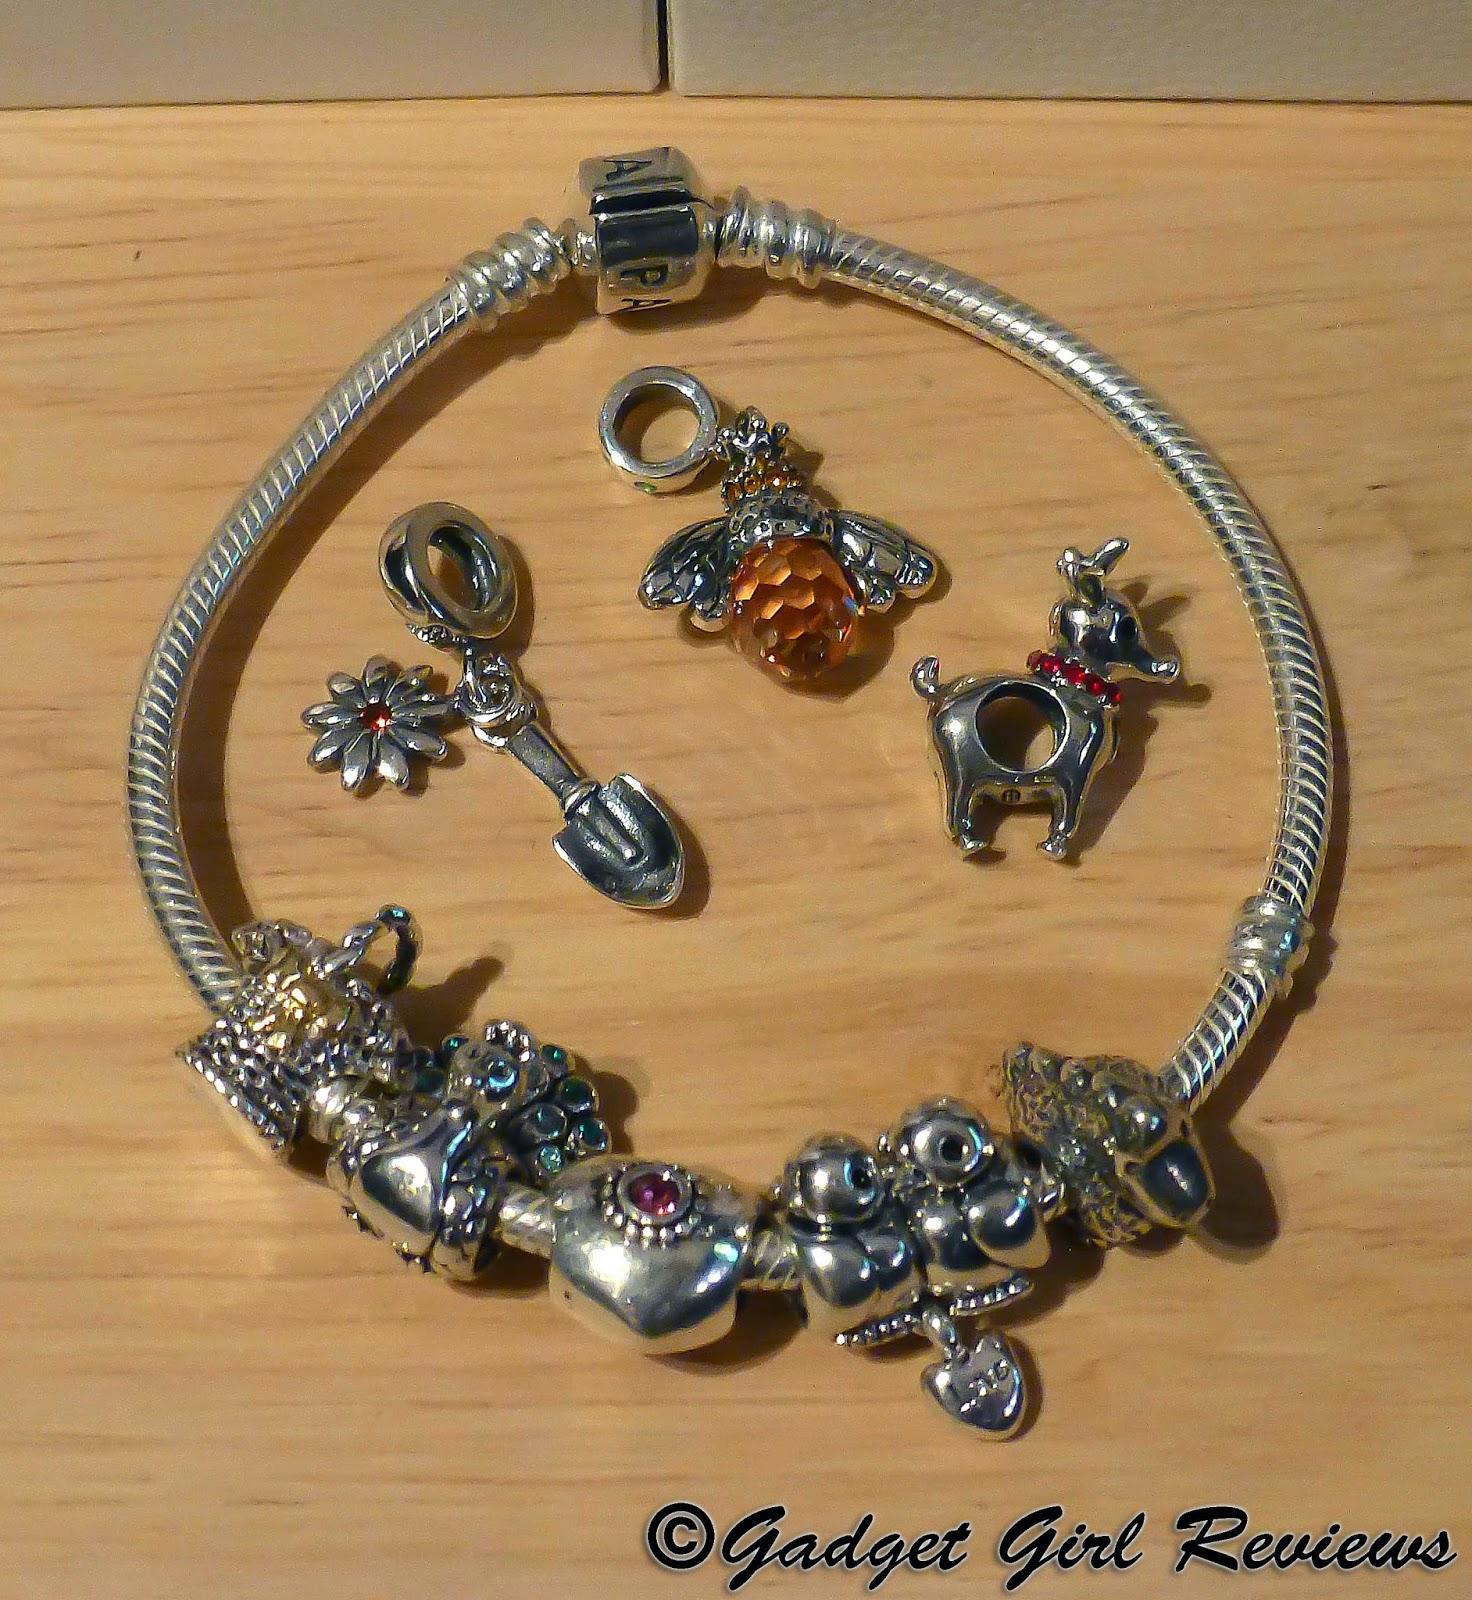 Pandora Charm Bracelet Review